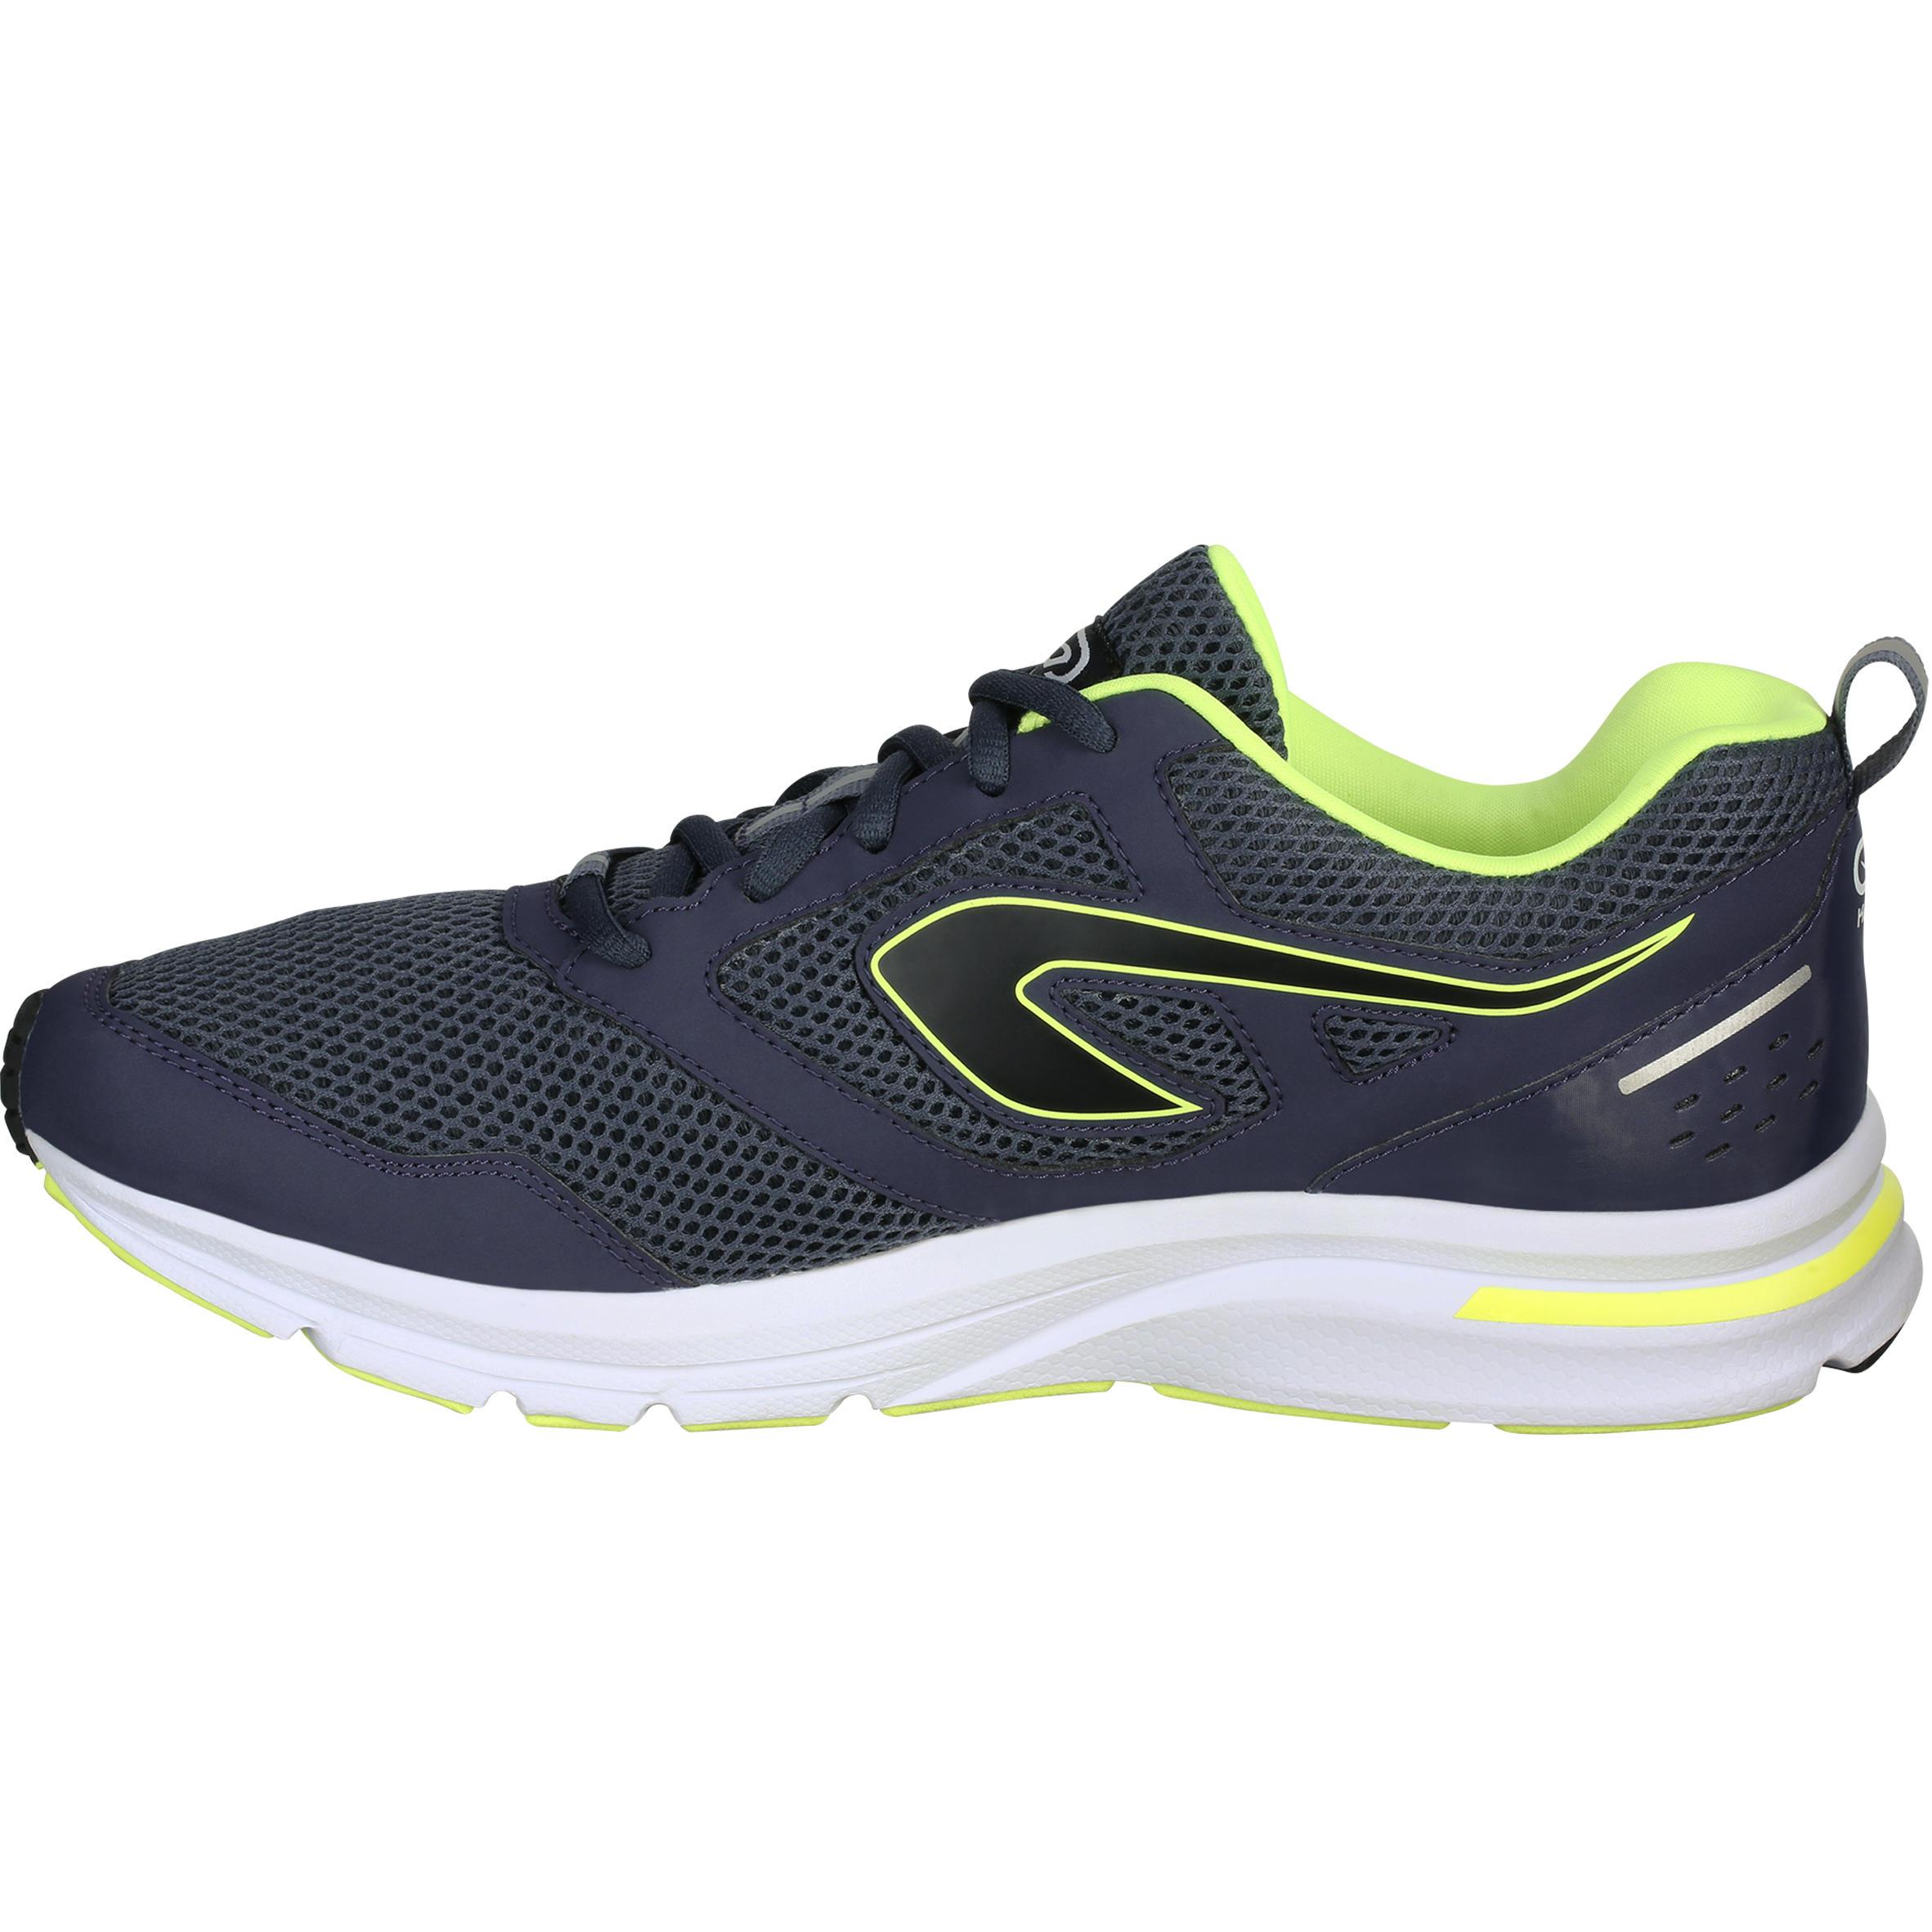 RUN ACTIVE MEN'S RUNNING SHOES - DARK GREY [RATING: 4.3 ★]